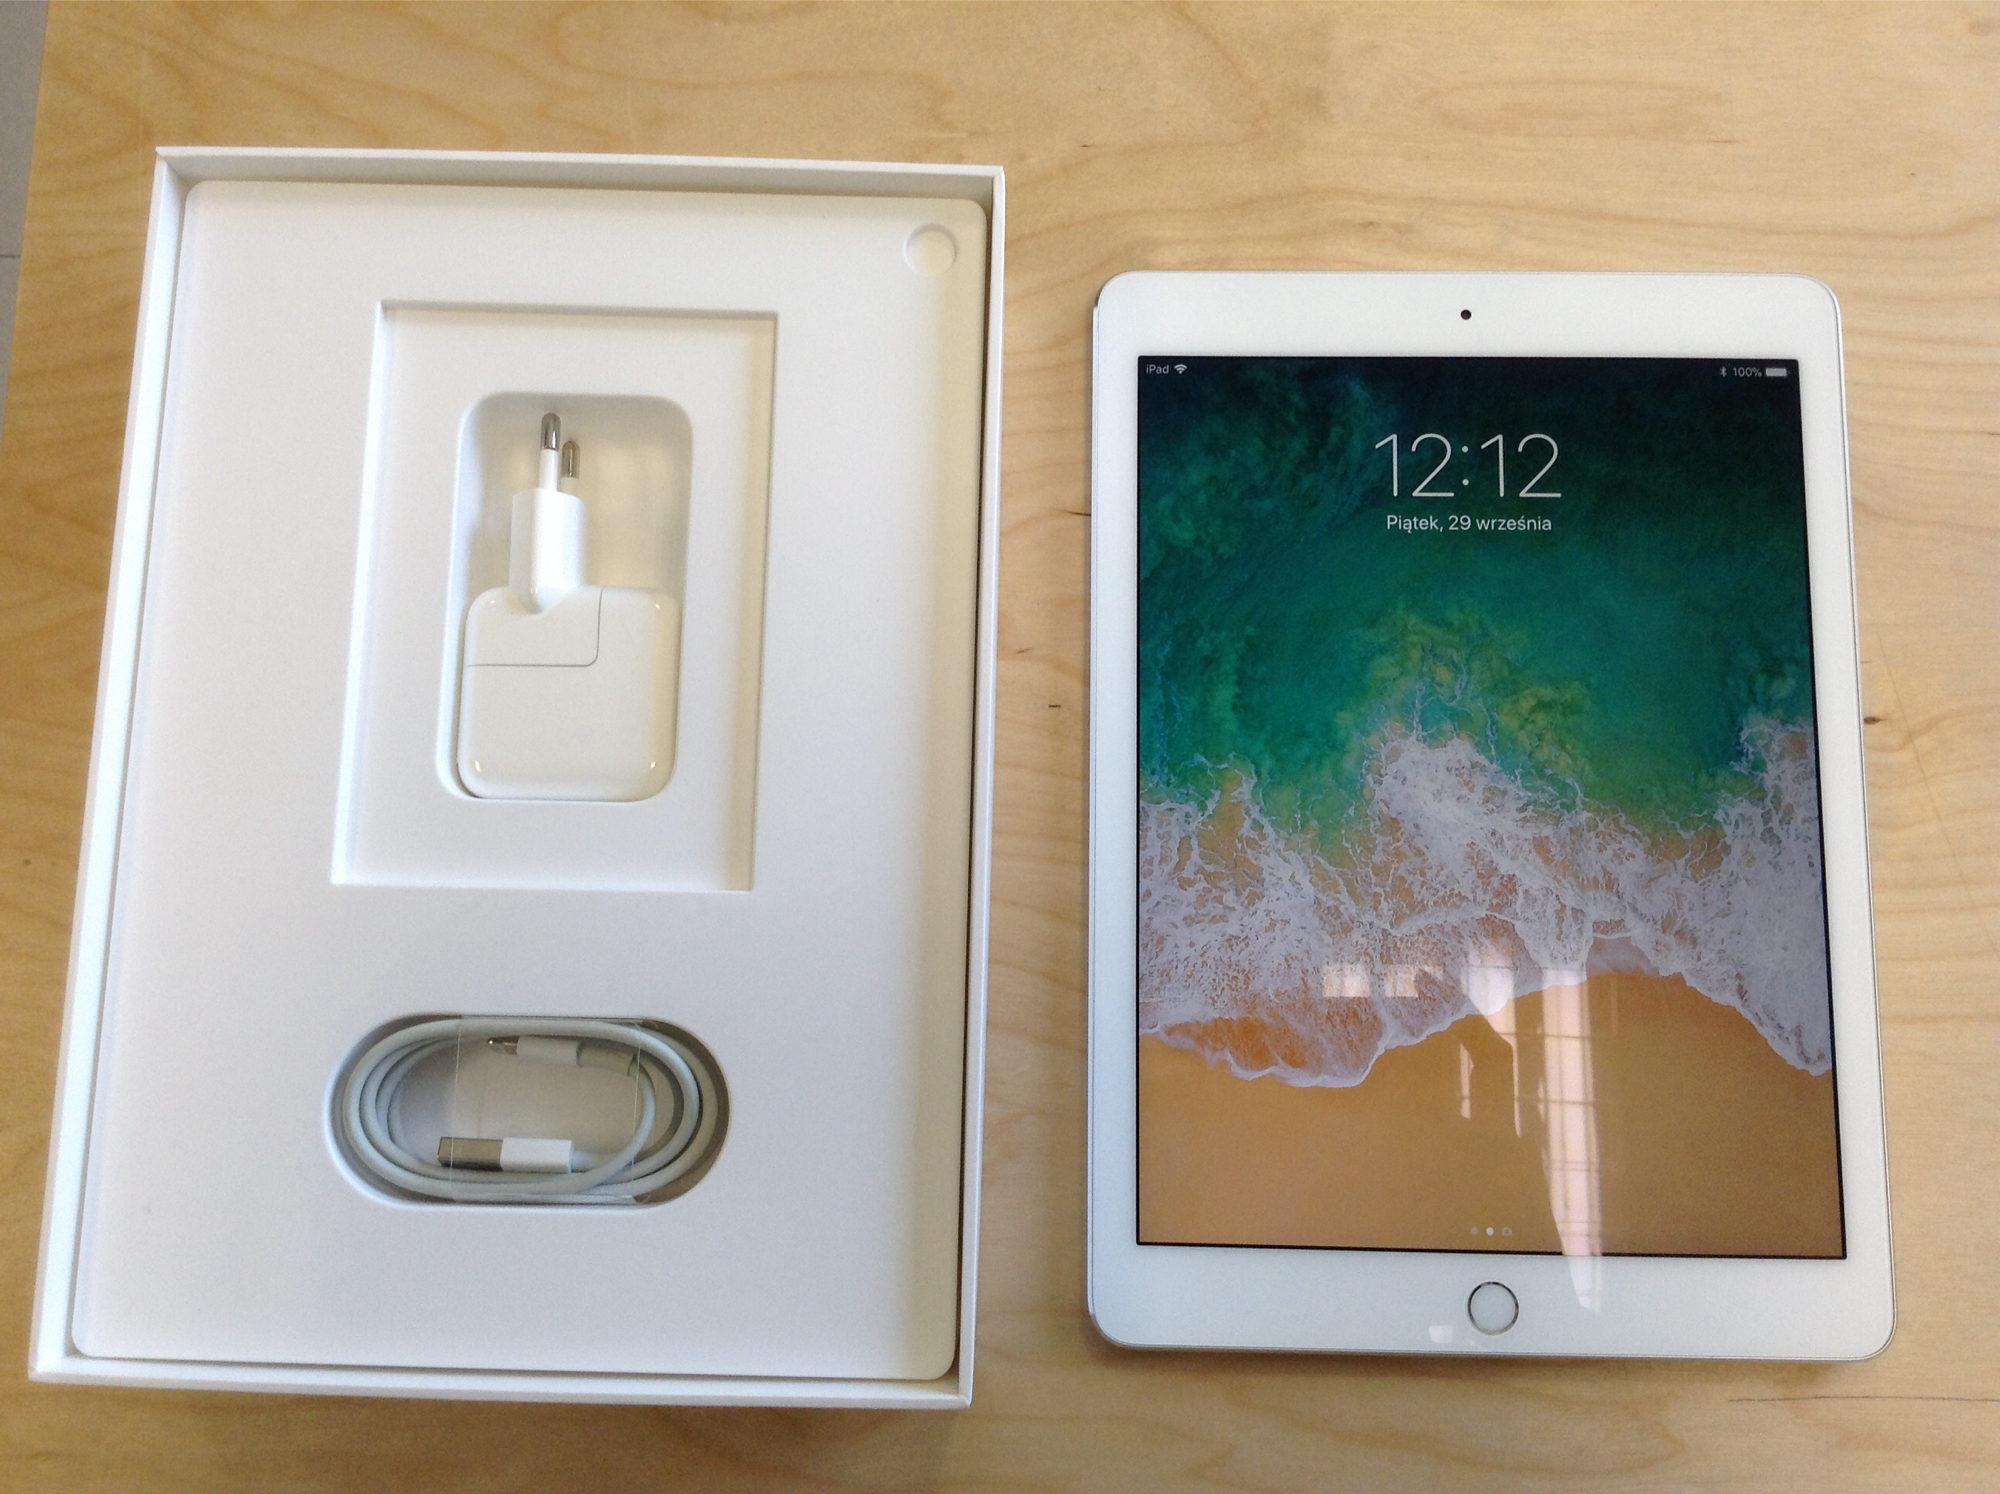 iPad Pro 9.7-inch (Wi-Fi), 128 GB, Gold, imagen 2